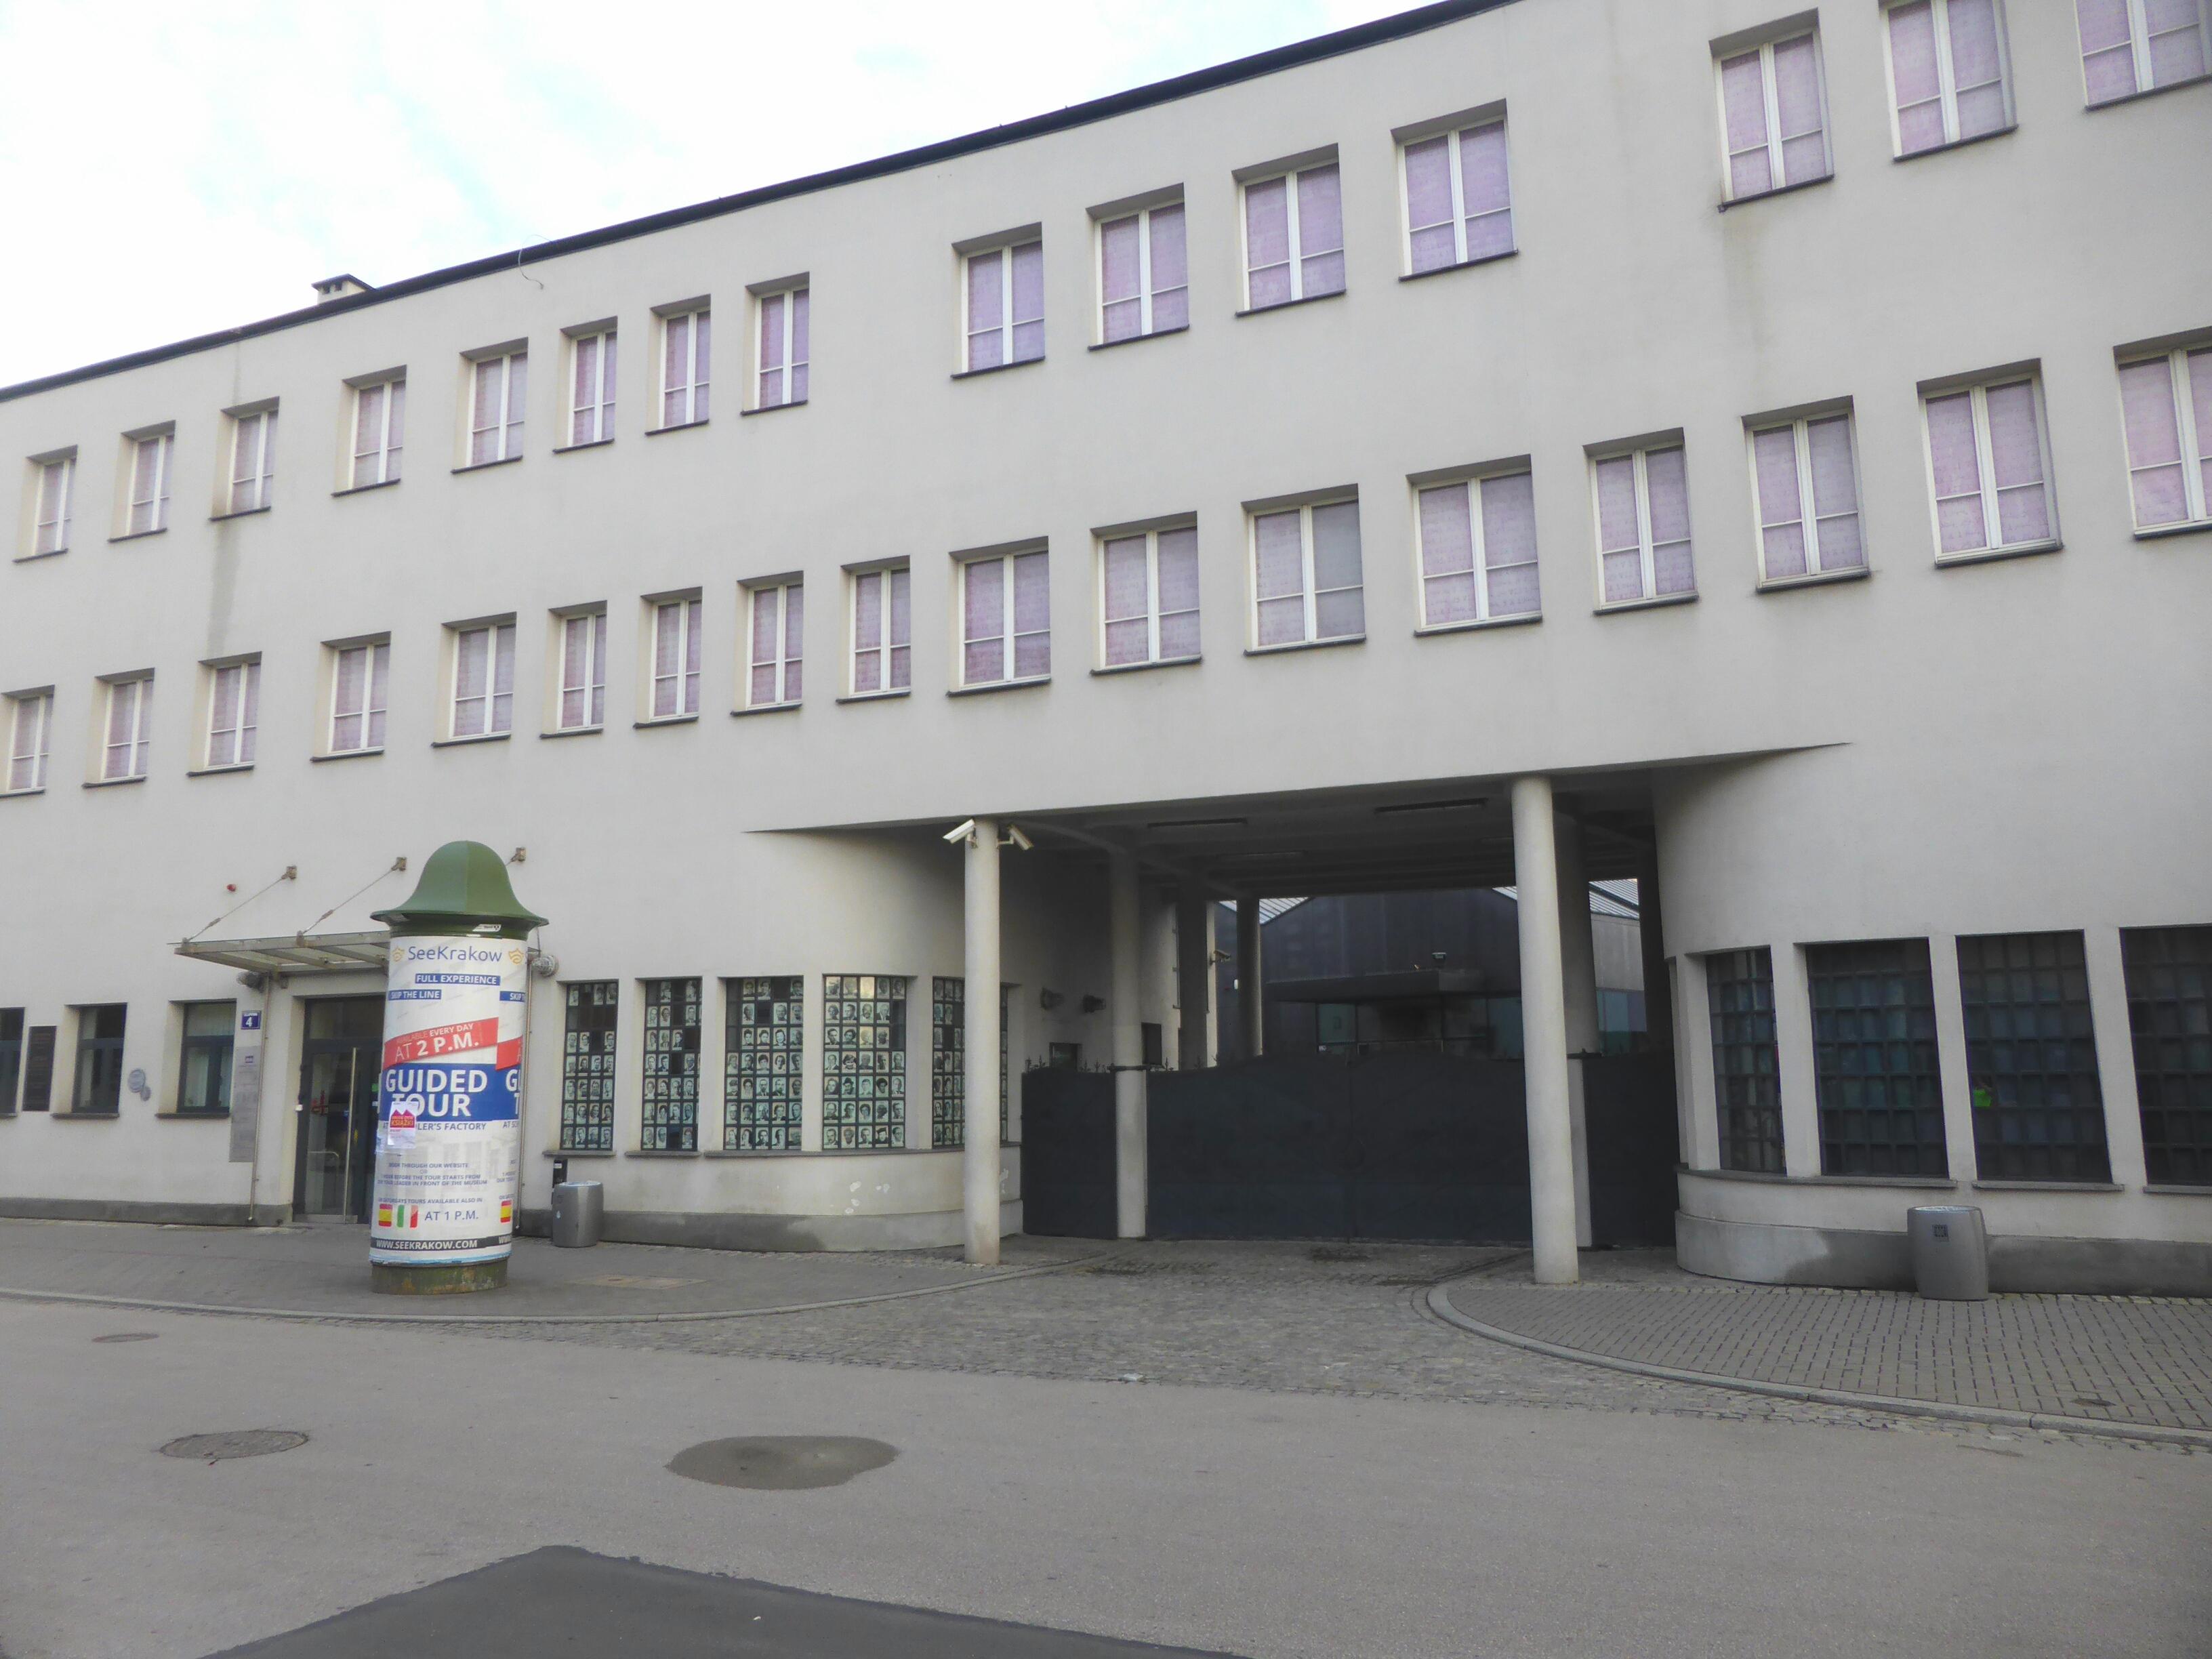 Hardlopen in Krakau, Schindler's fabiek